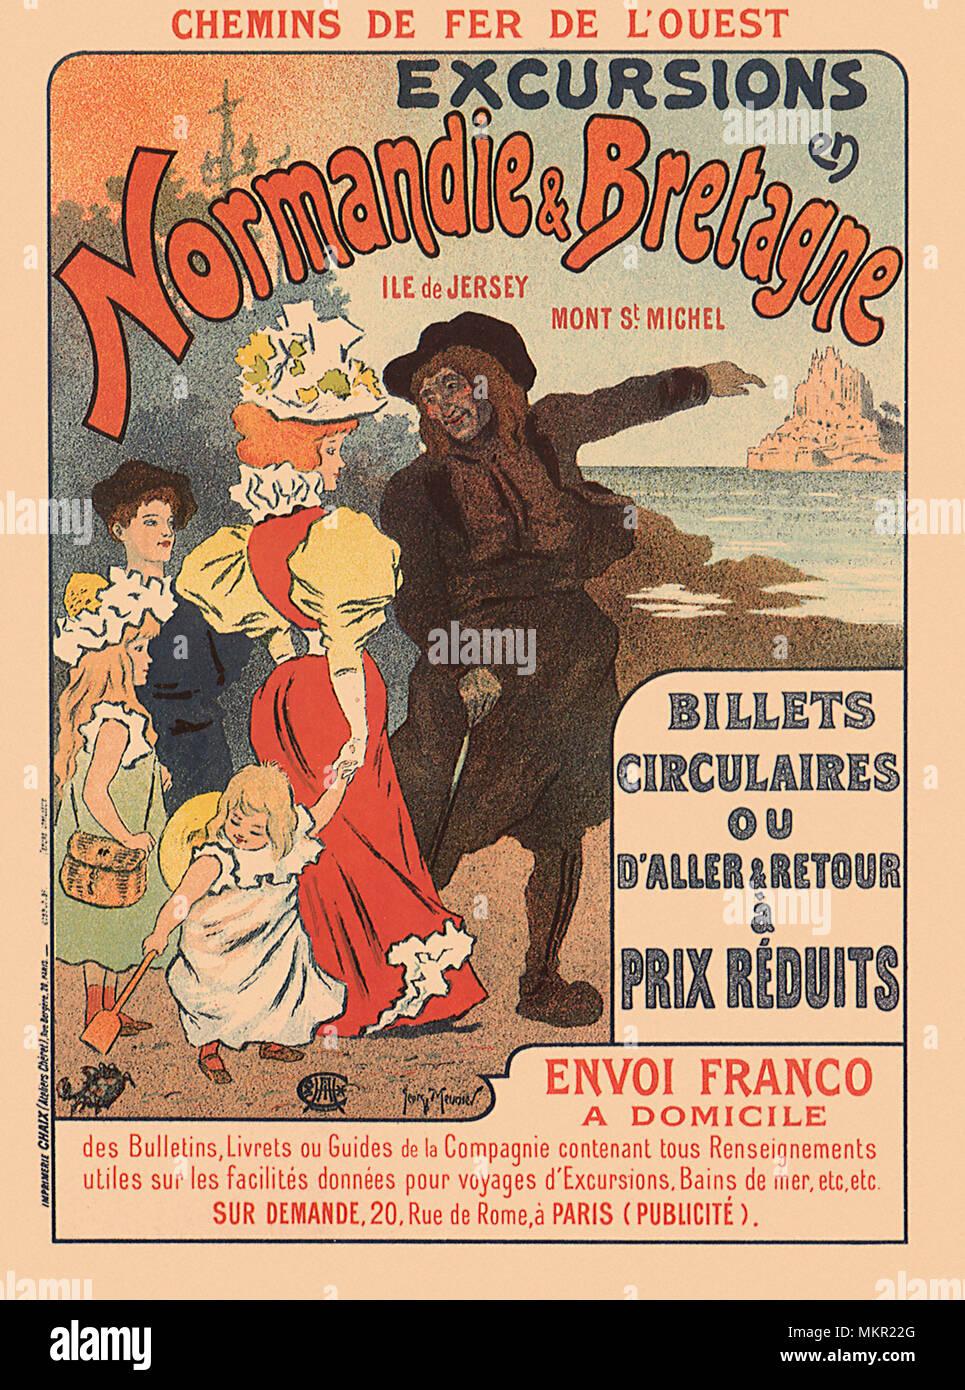 FRANCE VINTAGE TRAVEL POSTER Normandie et Bretagne NEW